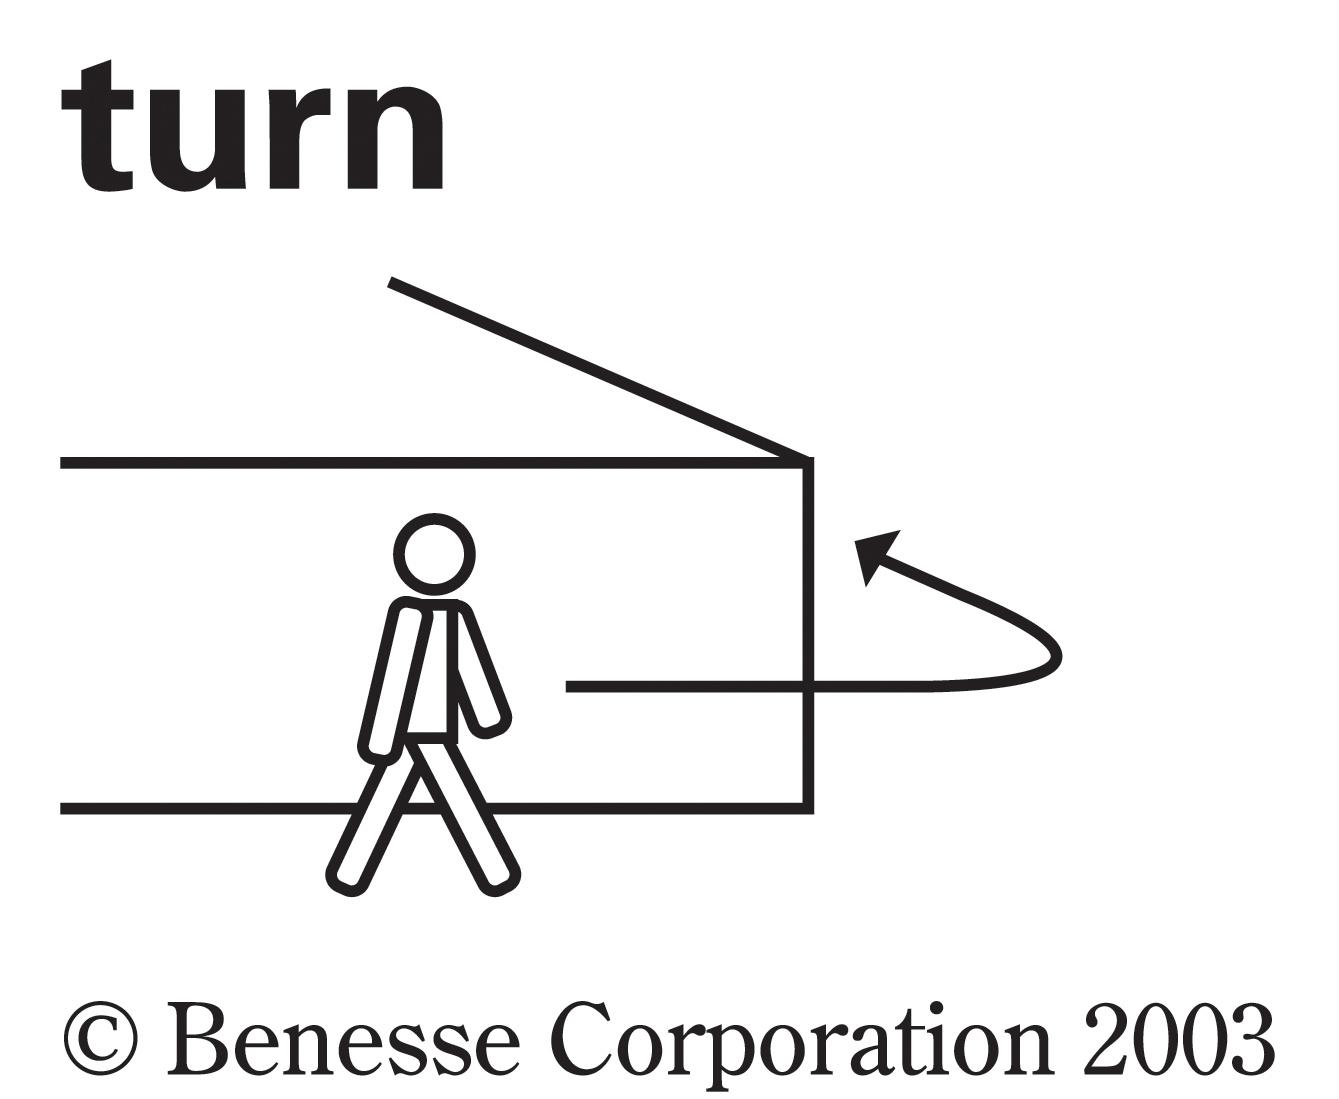 turn03.jpg